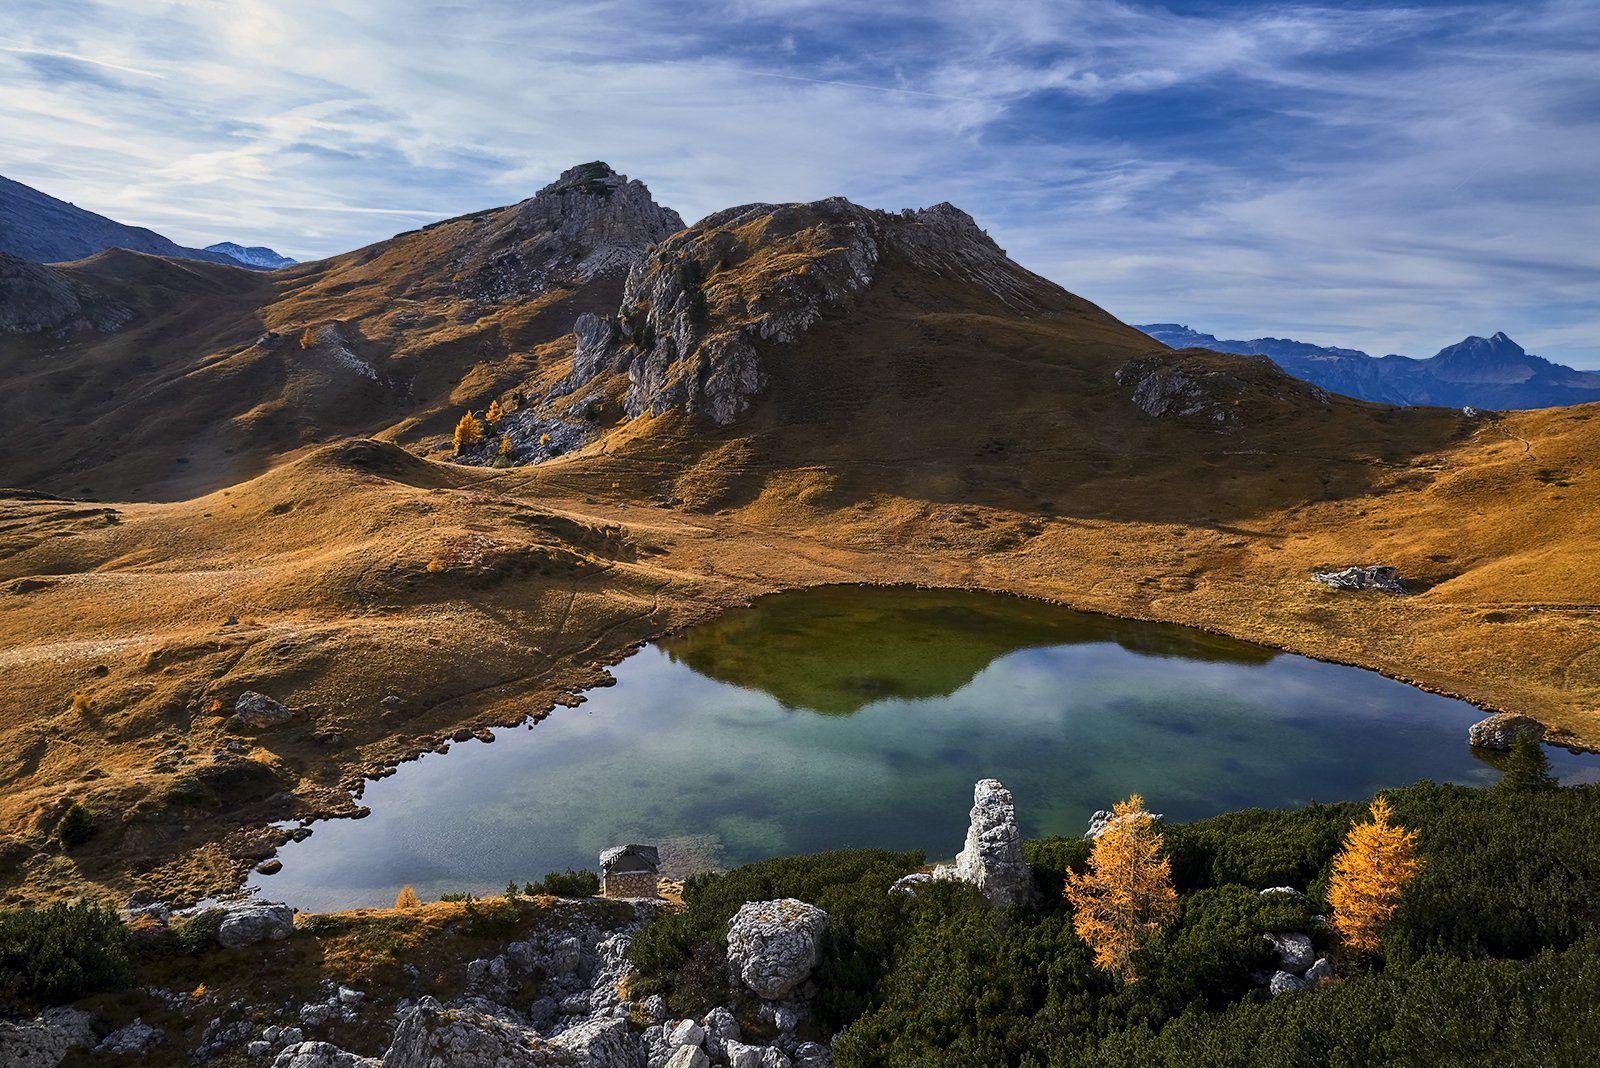 lake,Passo Valparola, Dolomites, Italy, Jan Siemiński